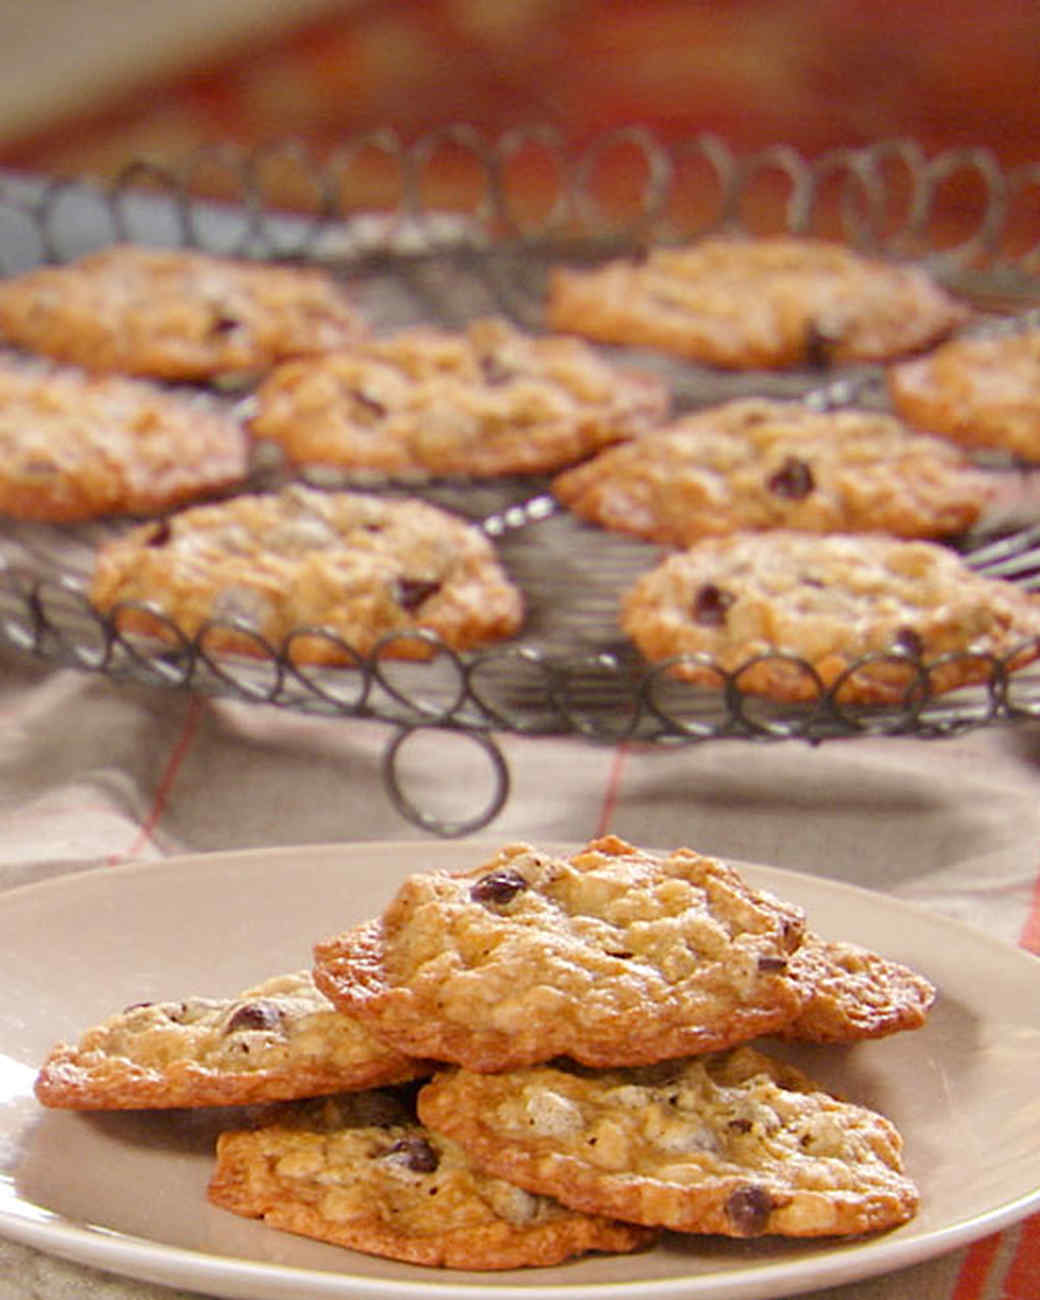 mh_1078_oatmeal_choc_chip_cookies.jpg